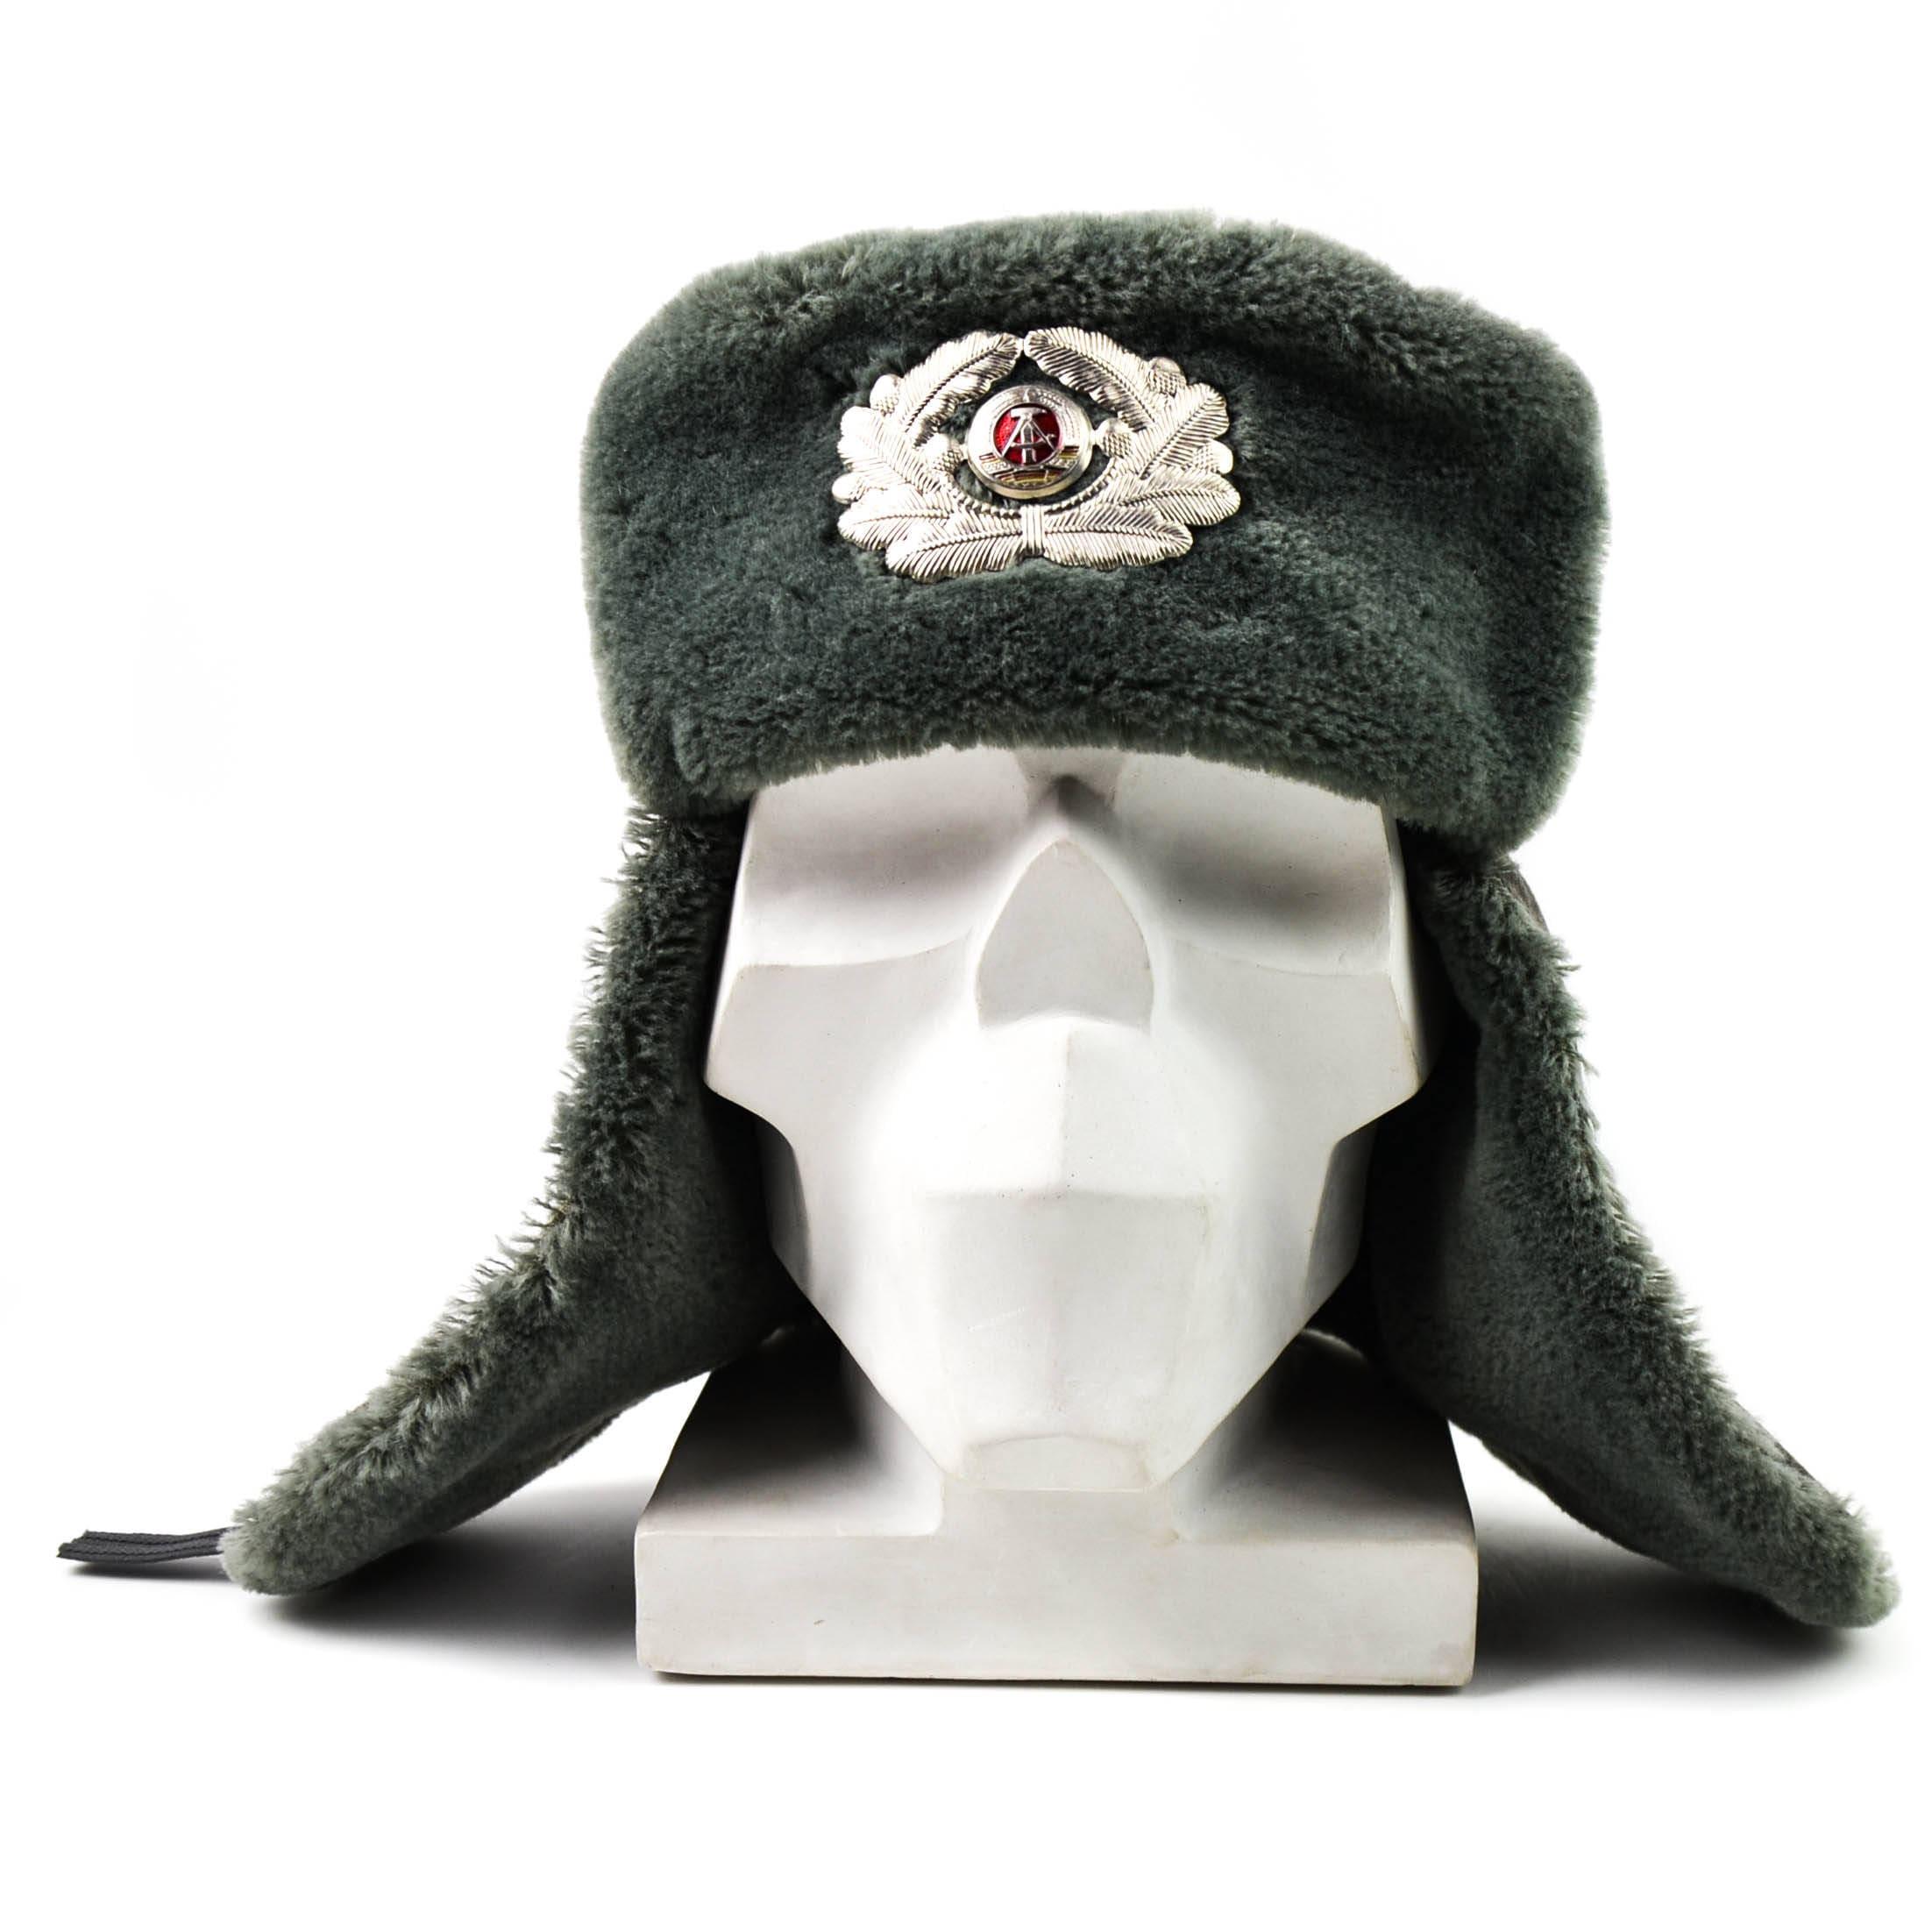 37db1d594 Original East German NVA army winter hat. Grey military ushanka hat with  badge